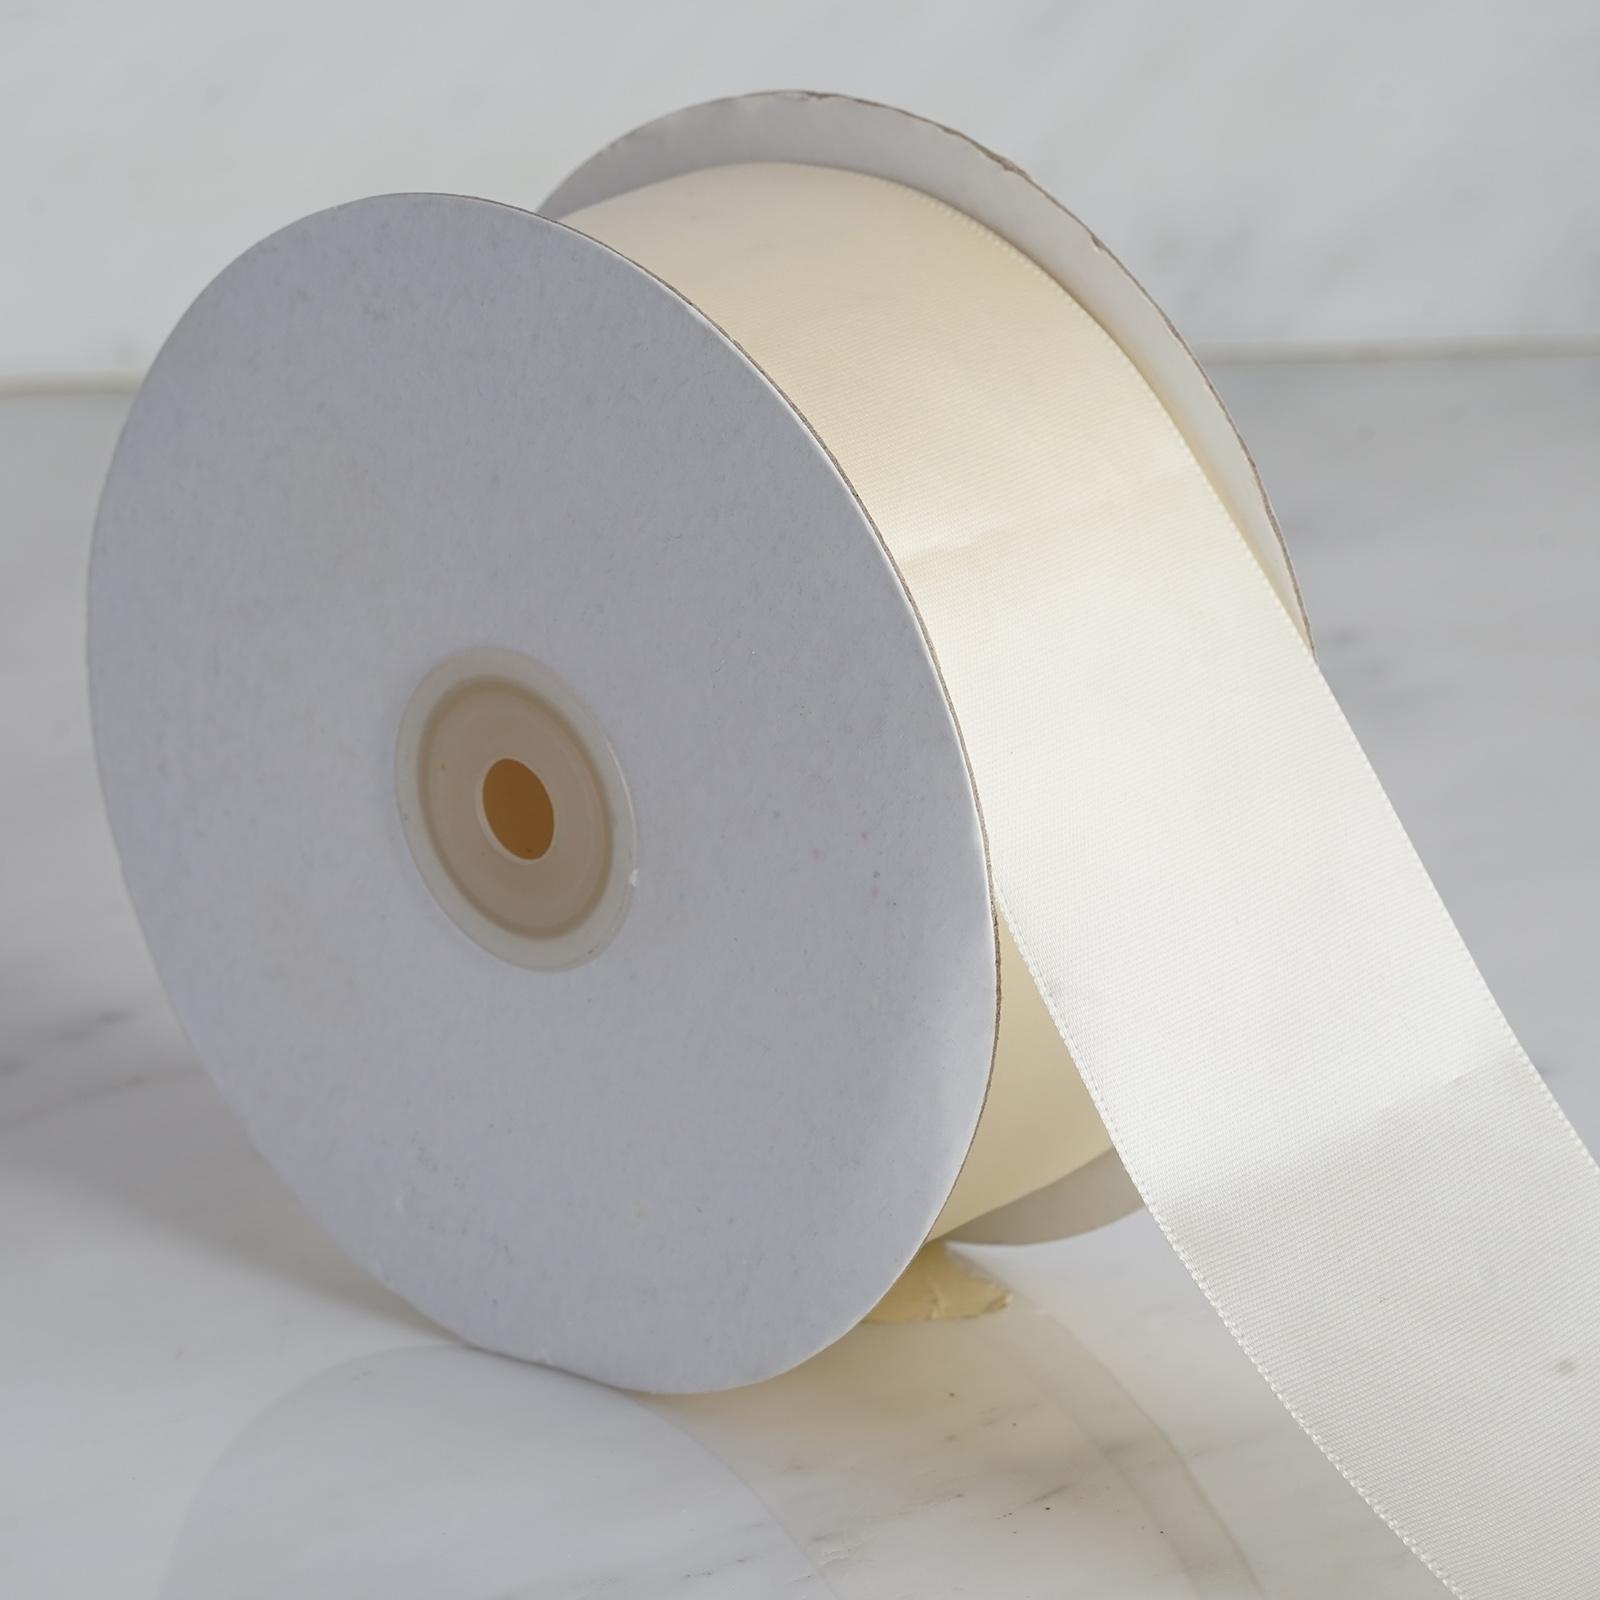 2-034-x-50-yards-Single-Side-Satin-Ribbon-Wedding-Favors-Sewing-Crafts-Decorations thumbnail 7